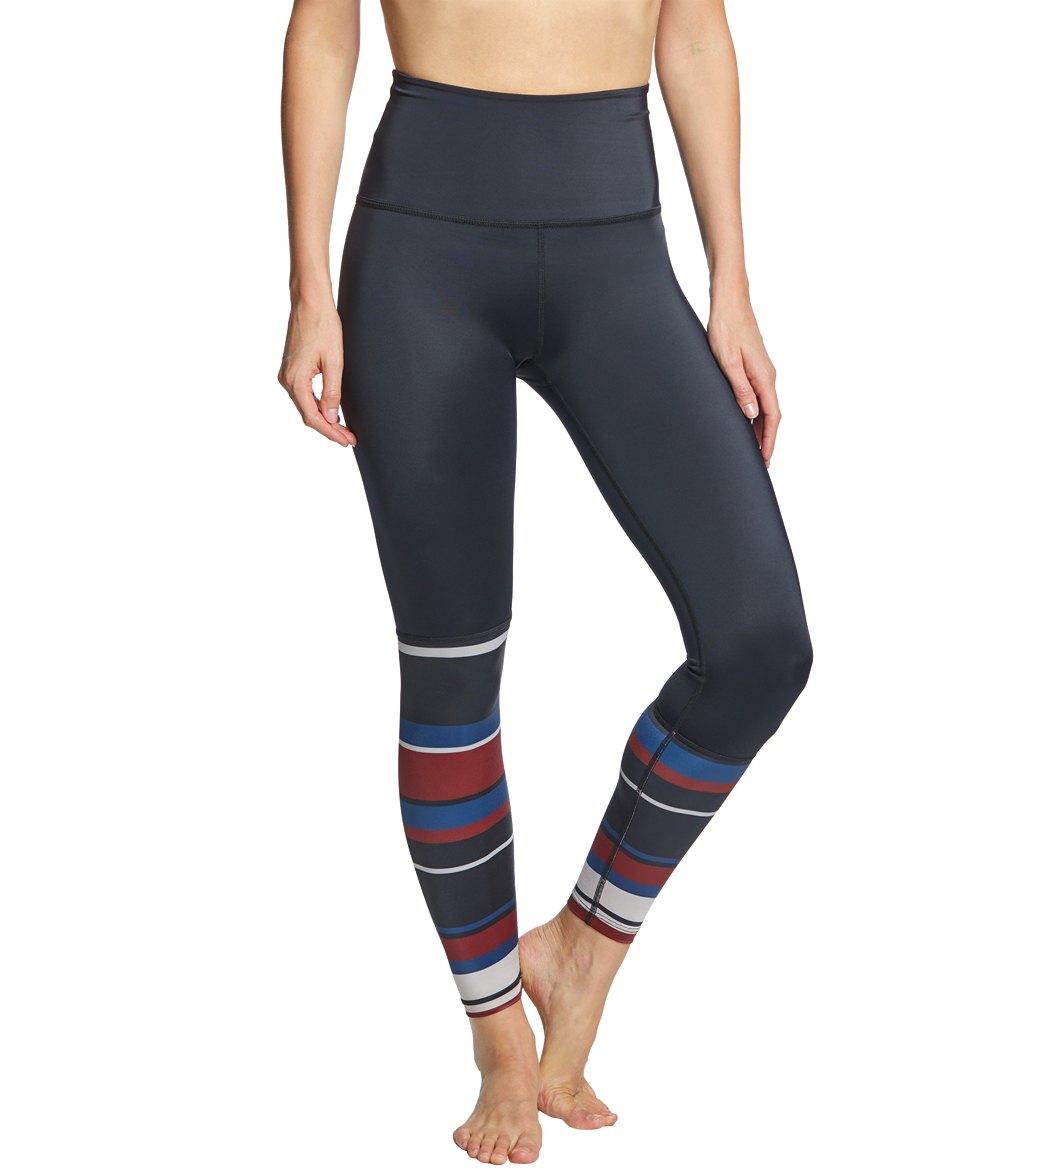 fcd3b875b Beyond Yoga Arlington High Waisted 7u002F8 Yoga Leggings